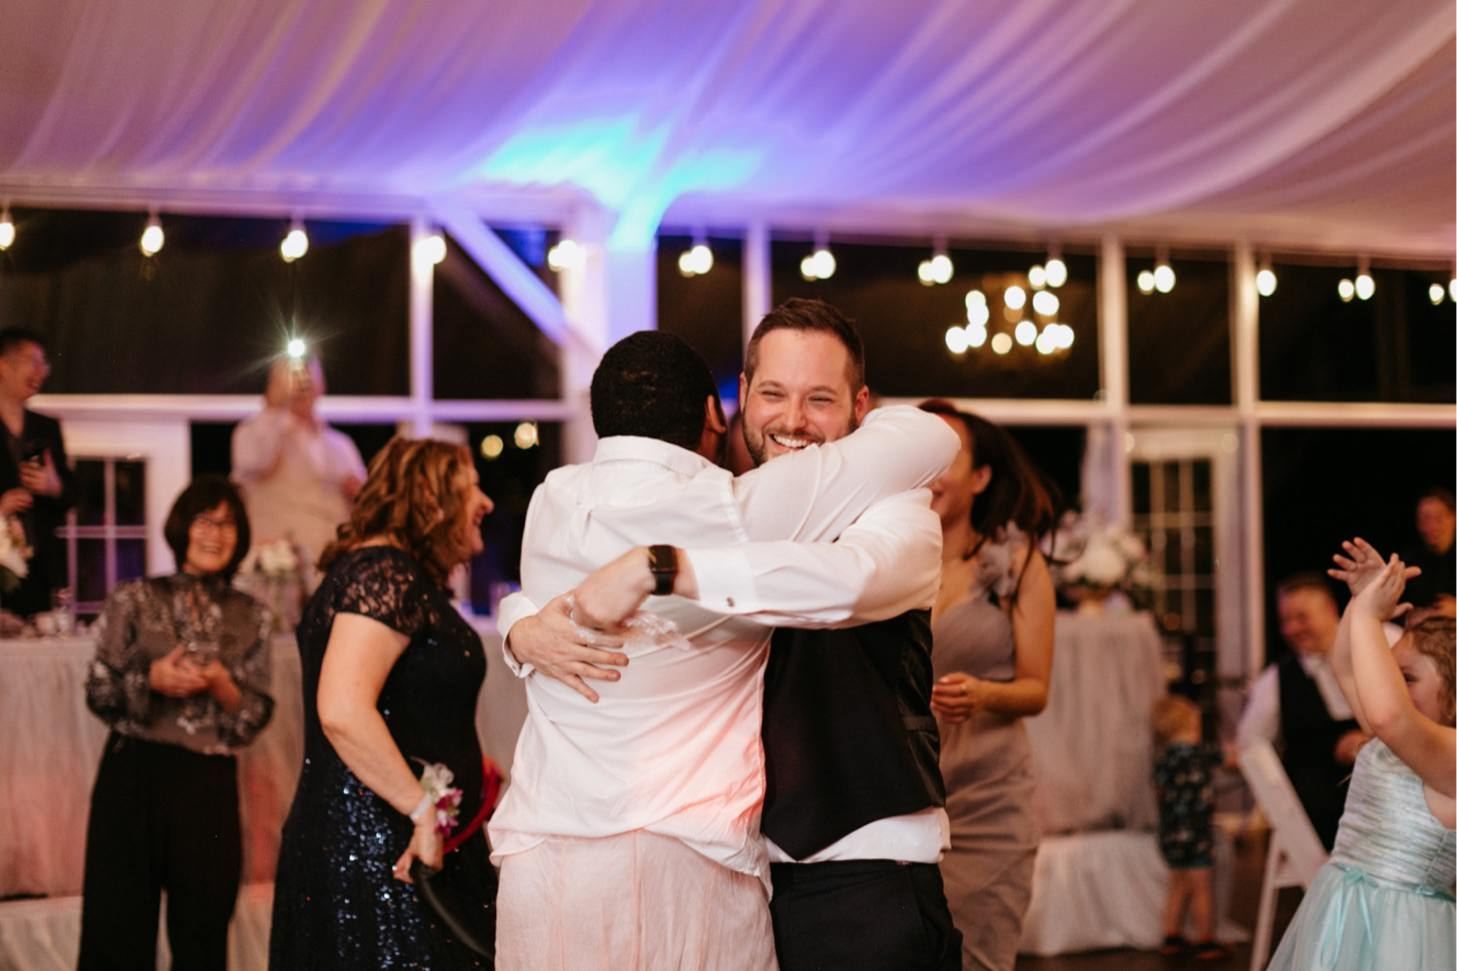 ritz-charles-wedding-reception-downtown-indianapolis-wedding-photographer078.JPG